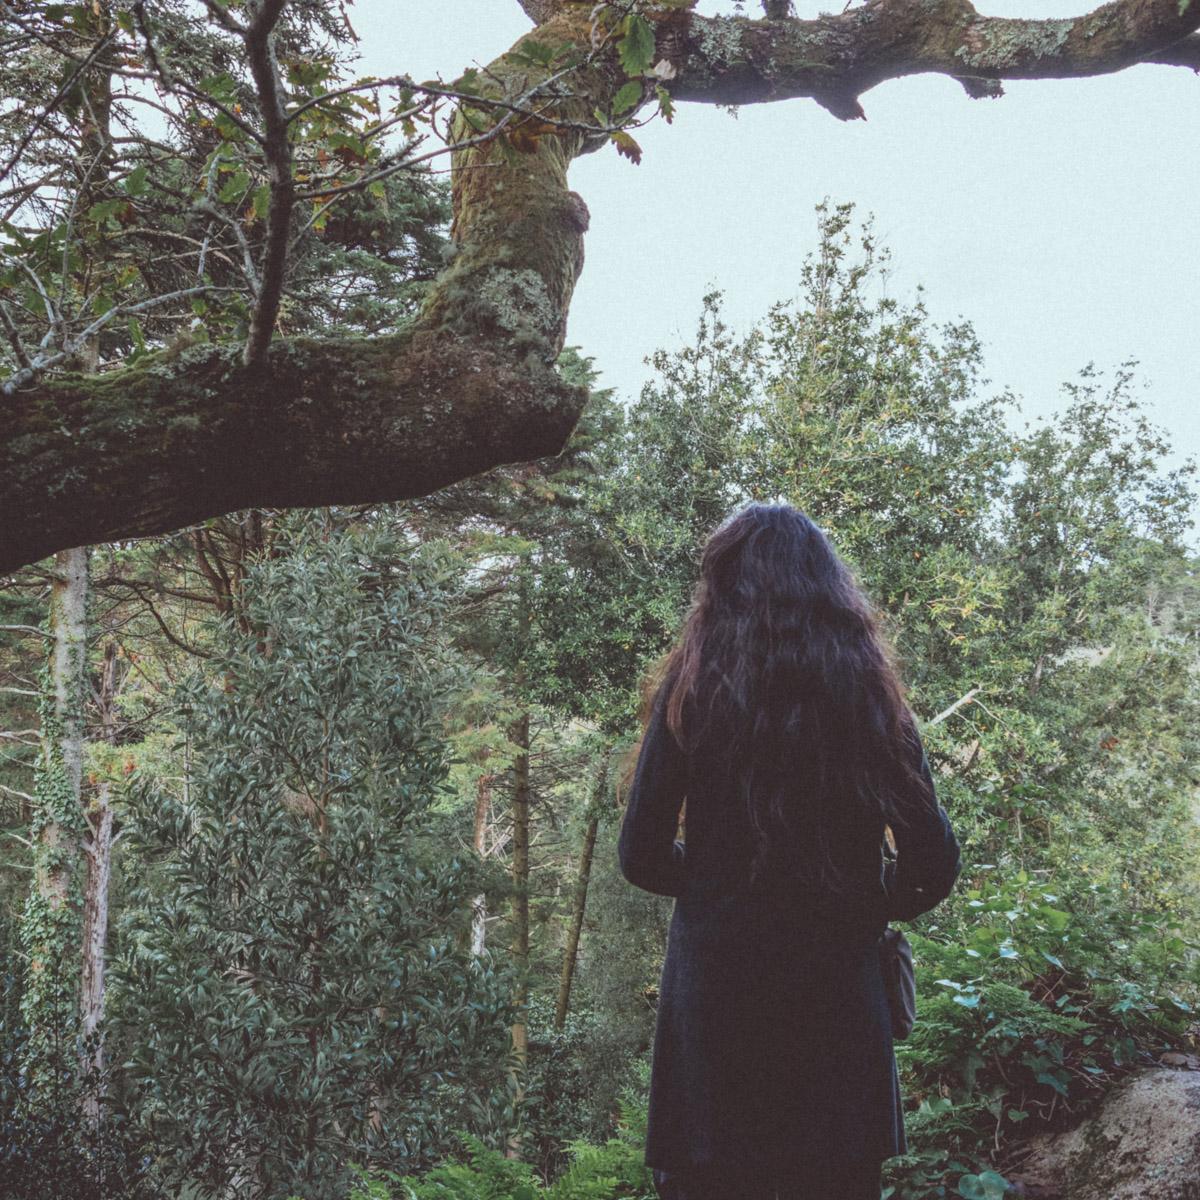 woman standing in forest by a oak tree